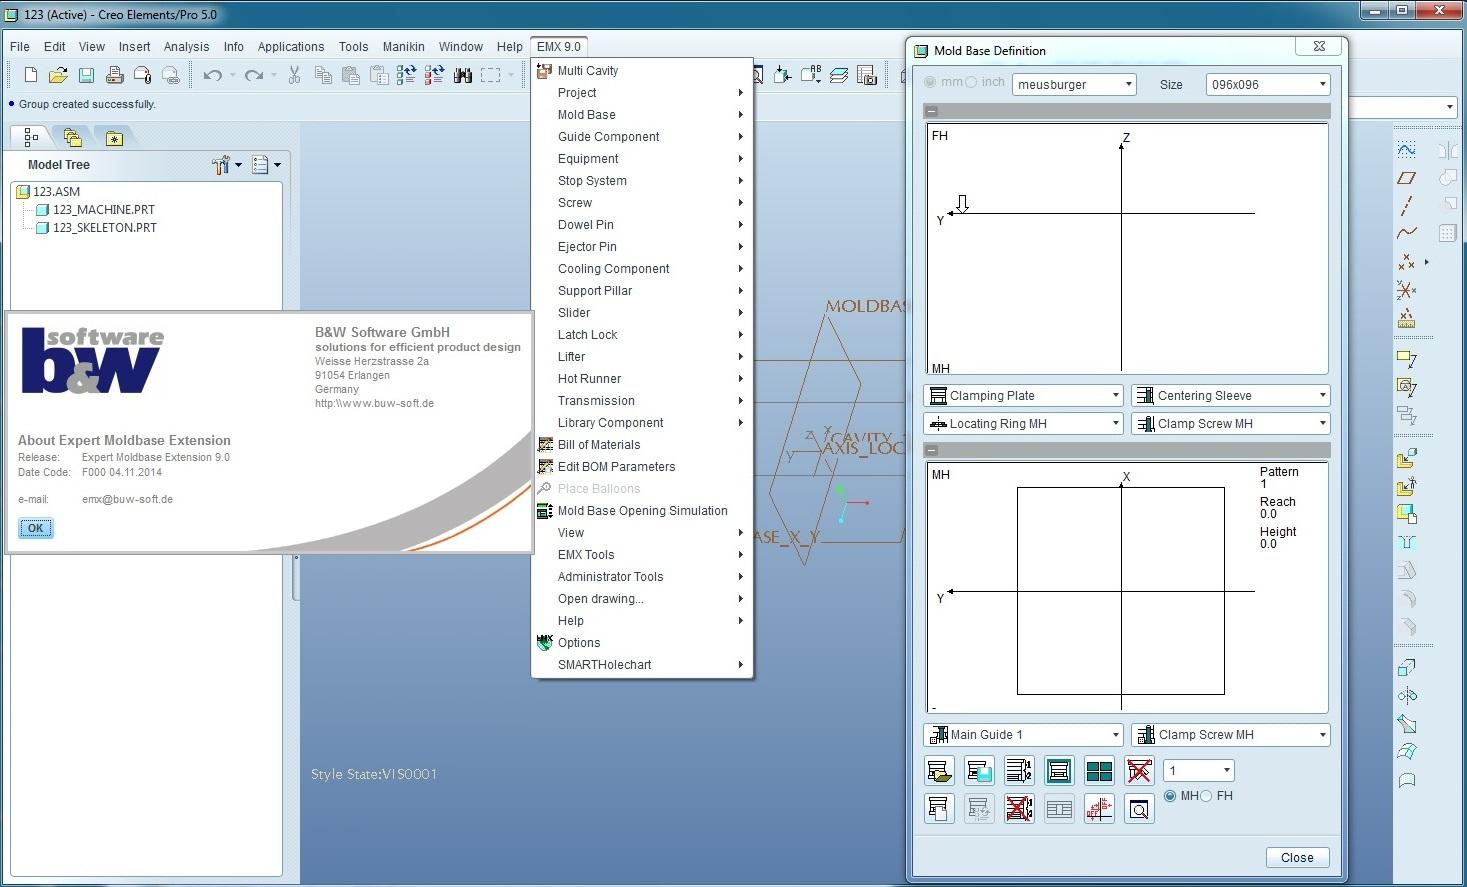 PTC Creo Expert Moldbase Extension 9.0 M020注册版-模架设计专家